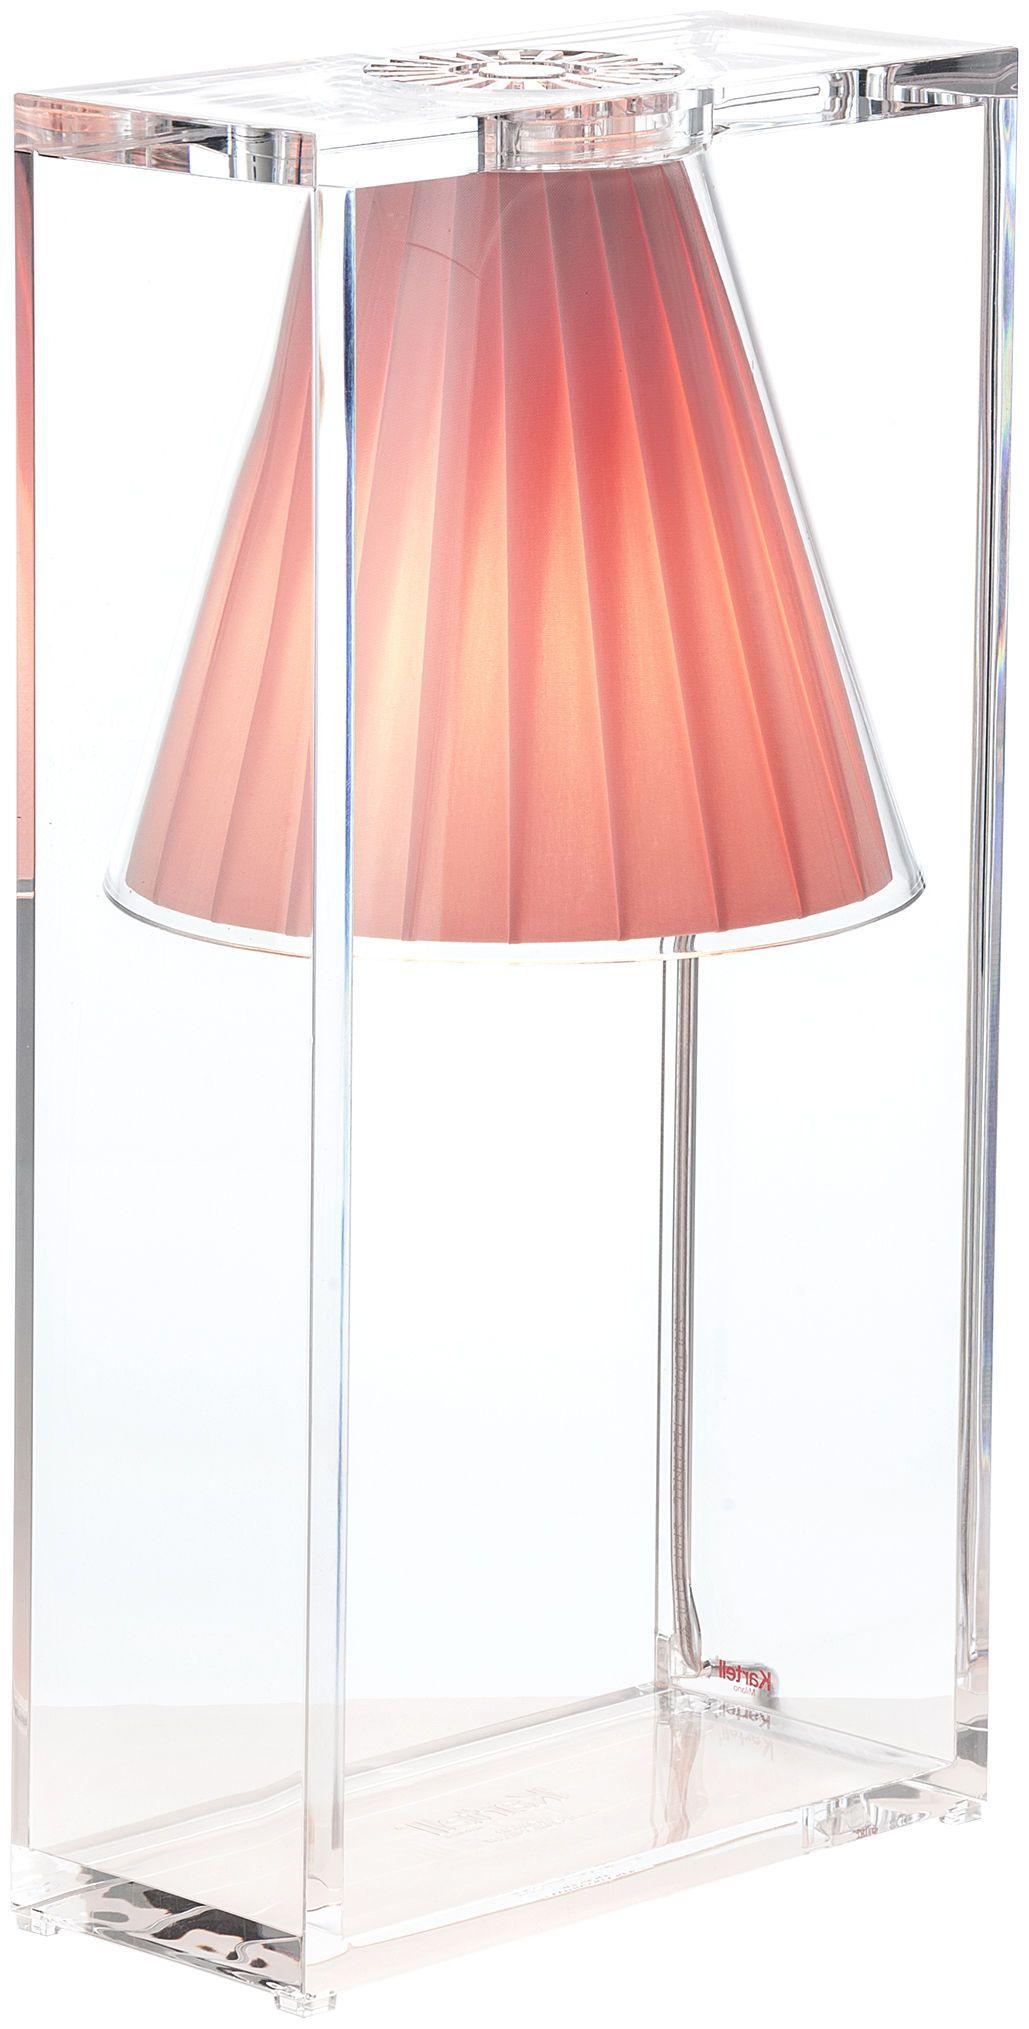 Lampe de table Light-Air / Abat-jour tissu - Kartell   To Light the ...